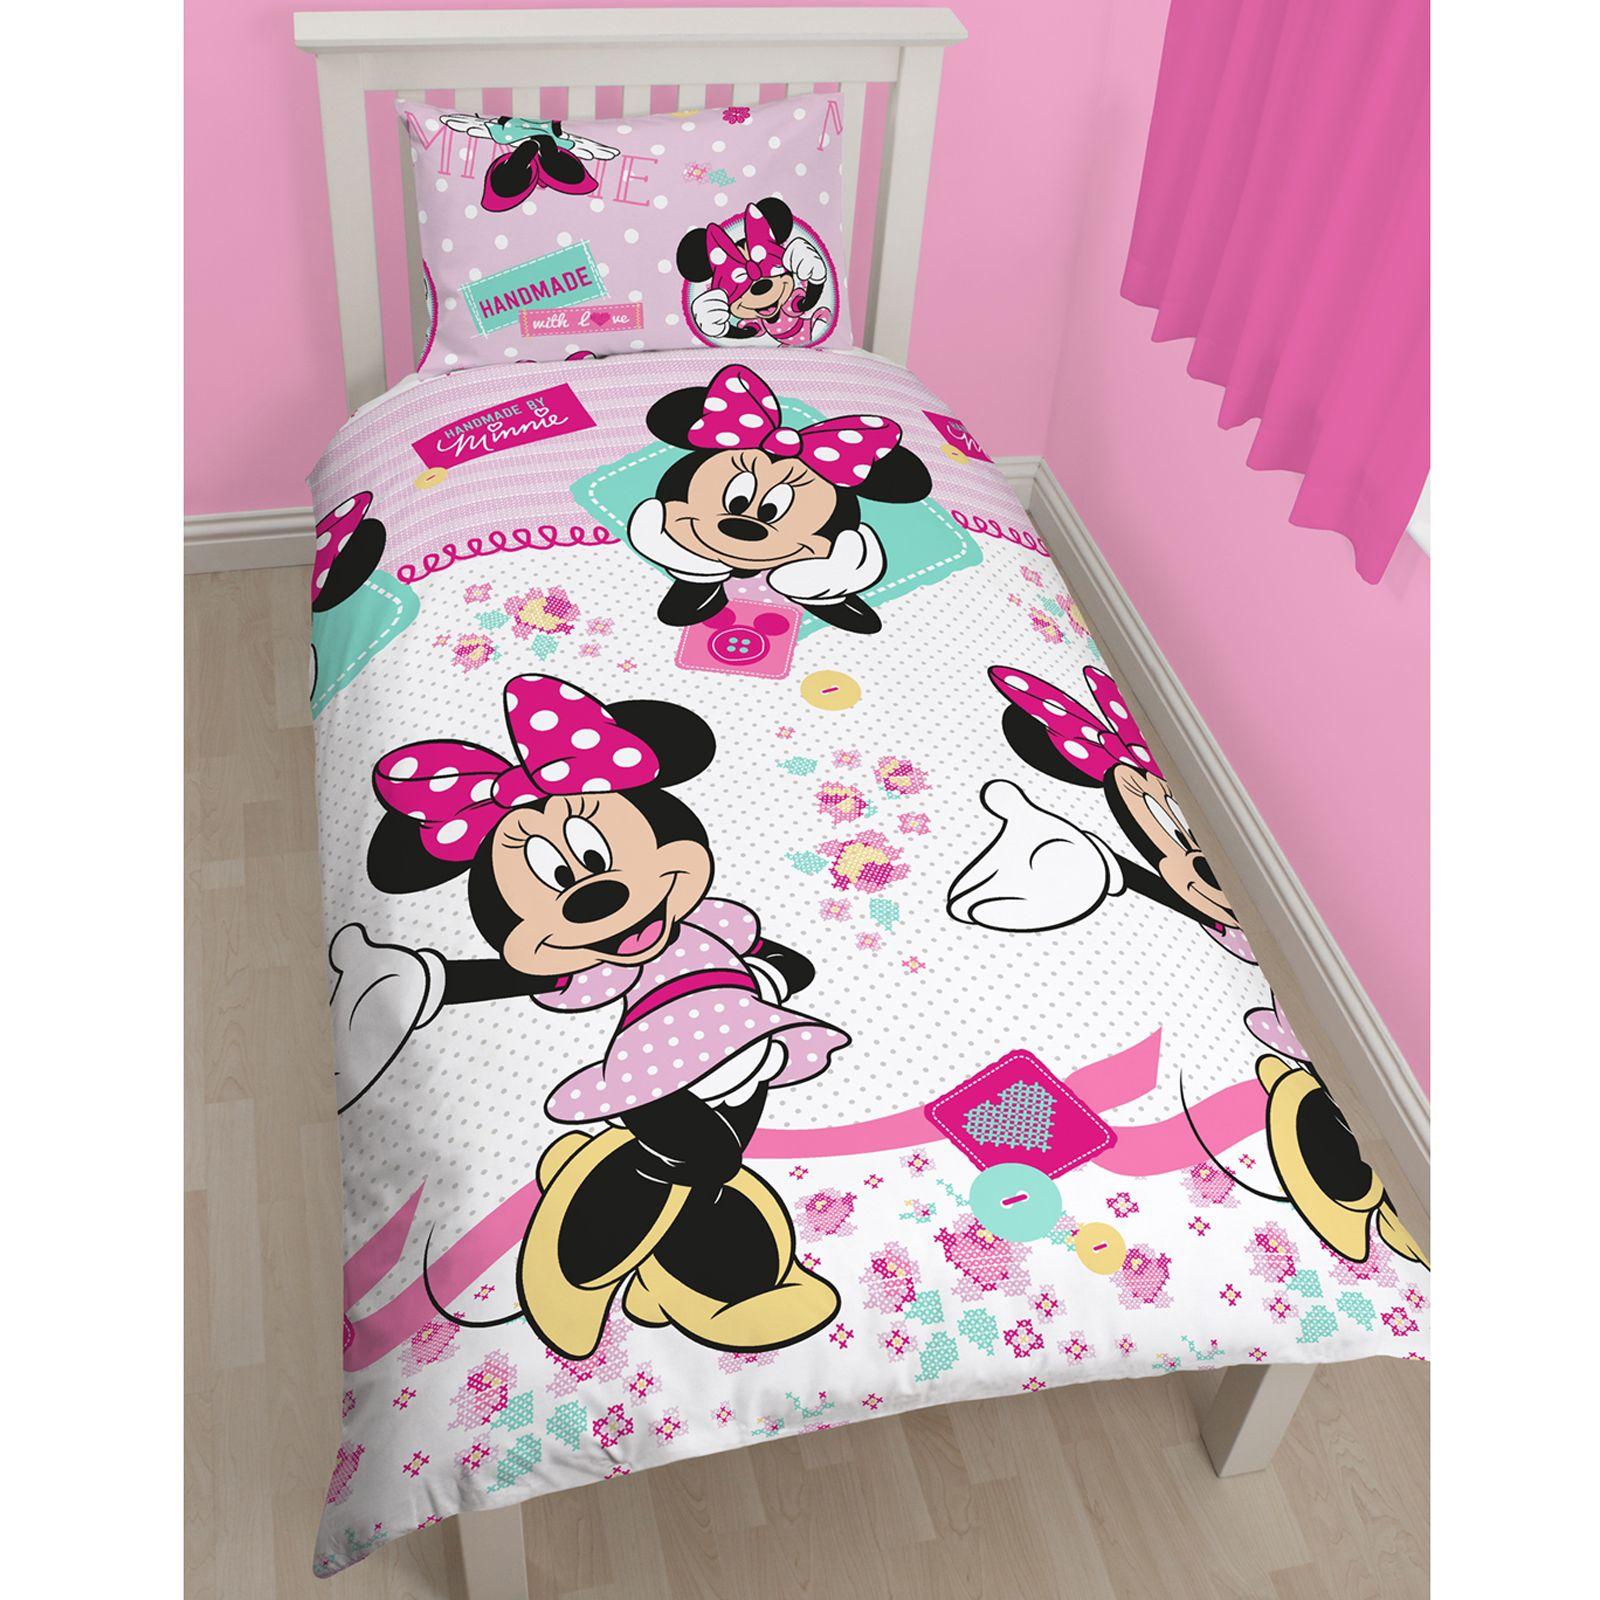 About minnie mouse single duvet cover set matching 66 quot x 54 quot curtains